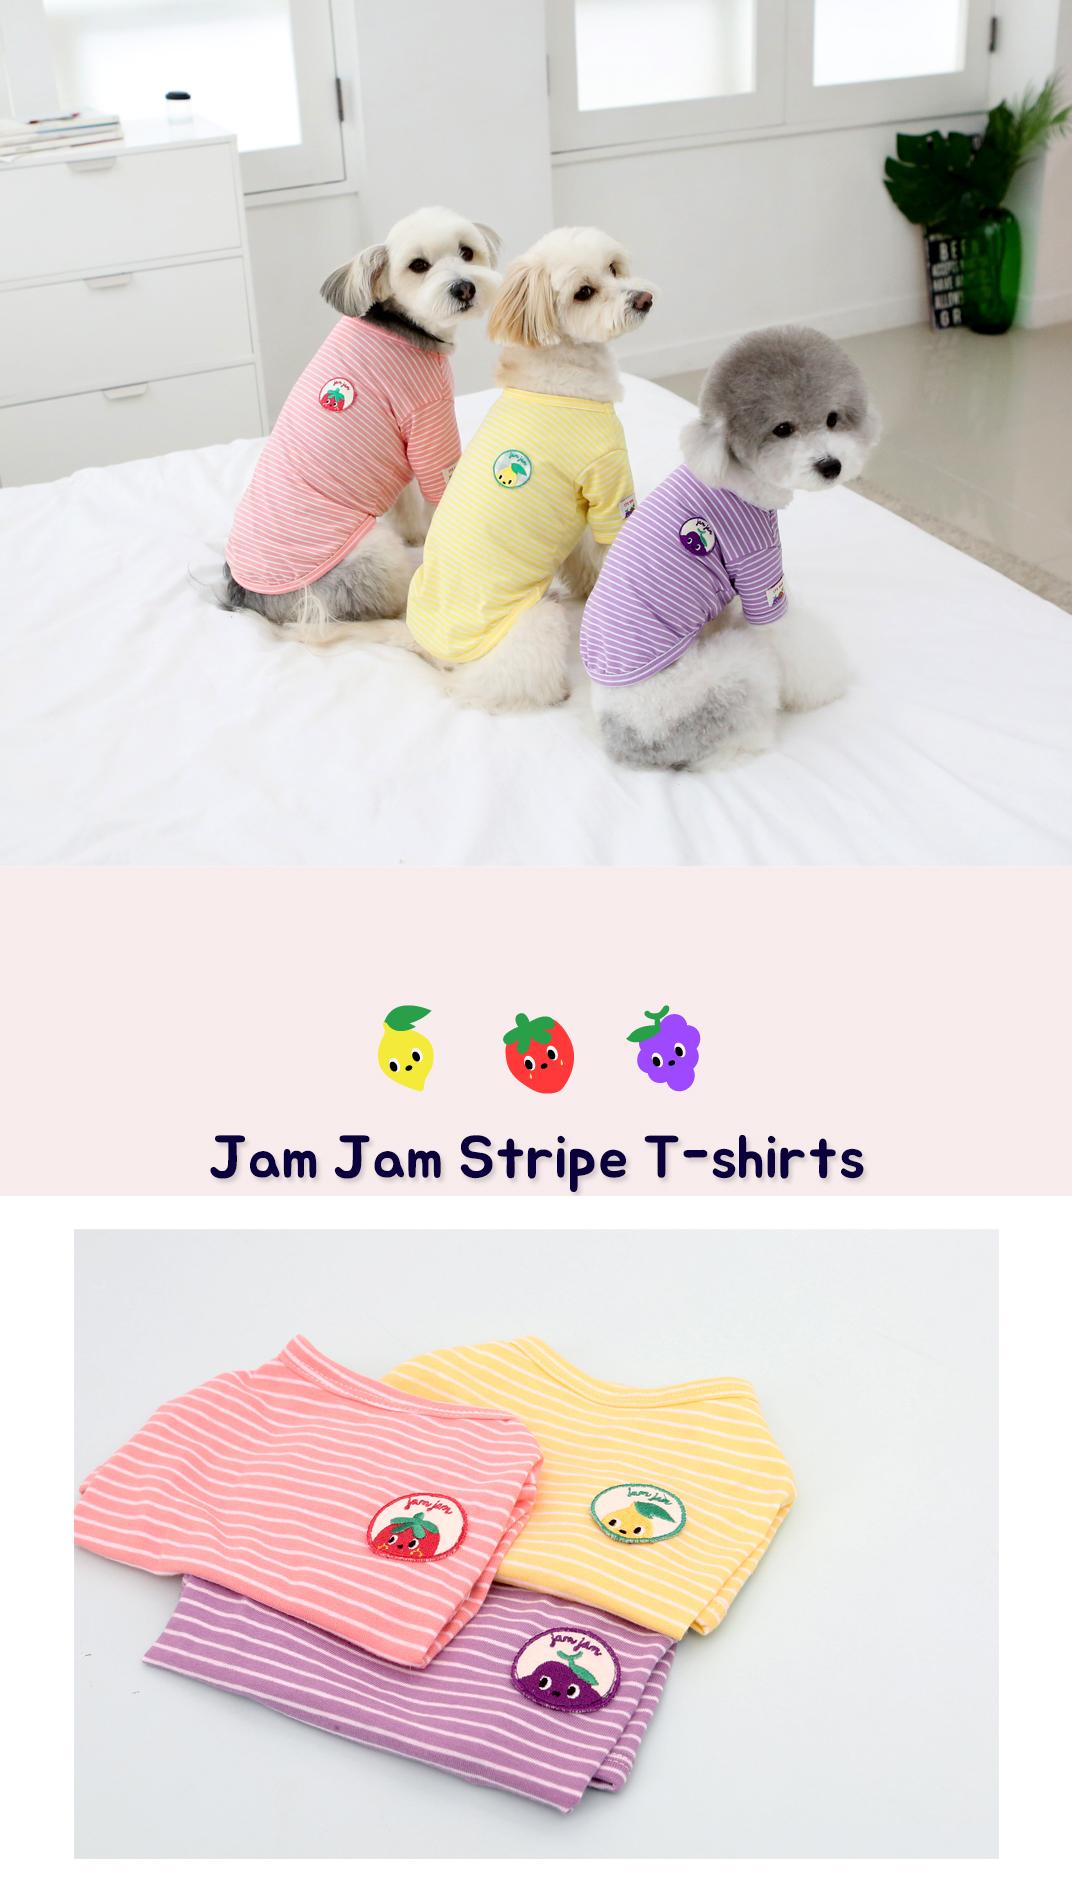 jamjam-stripe-t-shirts-00.jpg